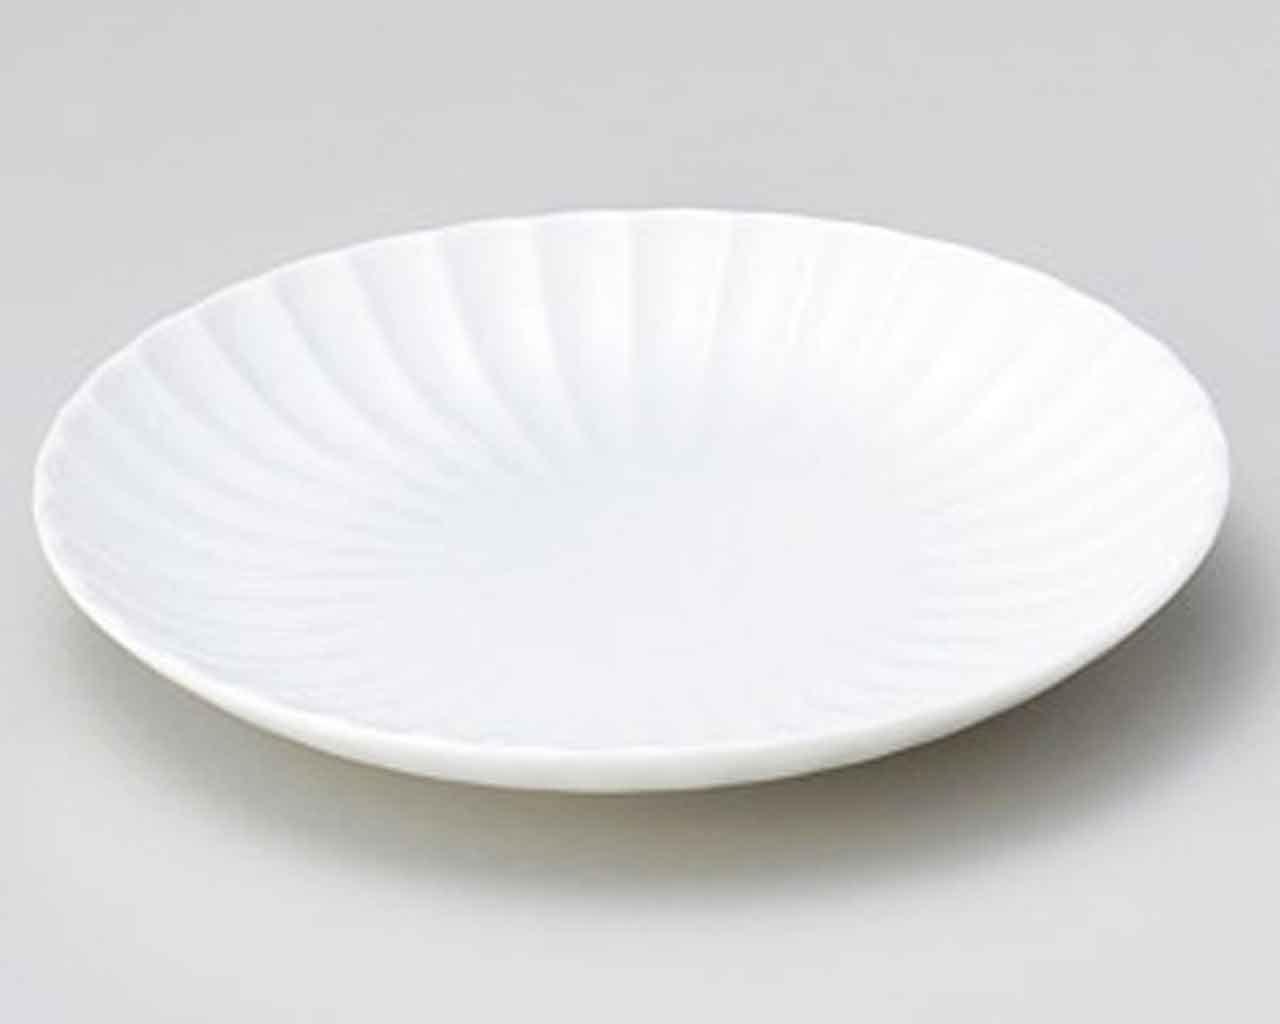 Shiragiku 5inch Set of 5 Small Plates White porcelain Made in Japan